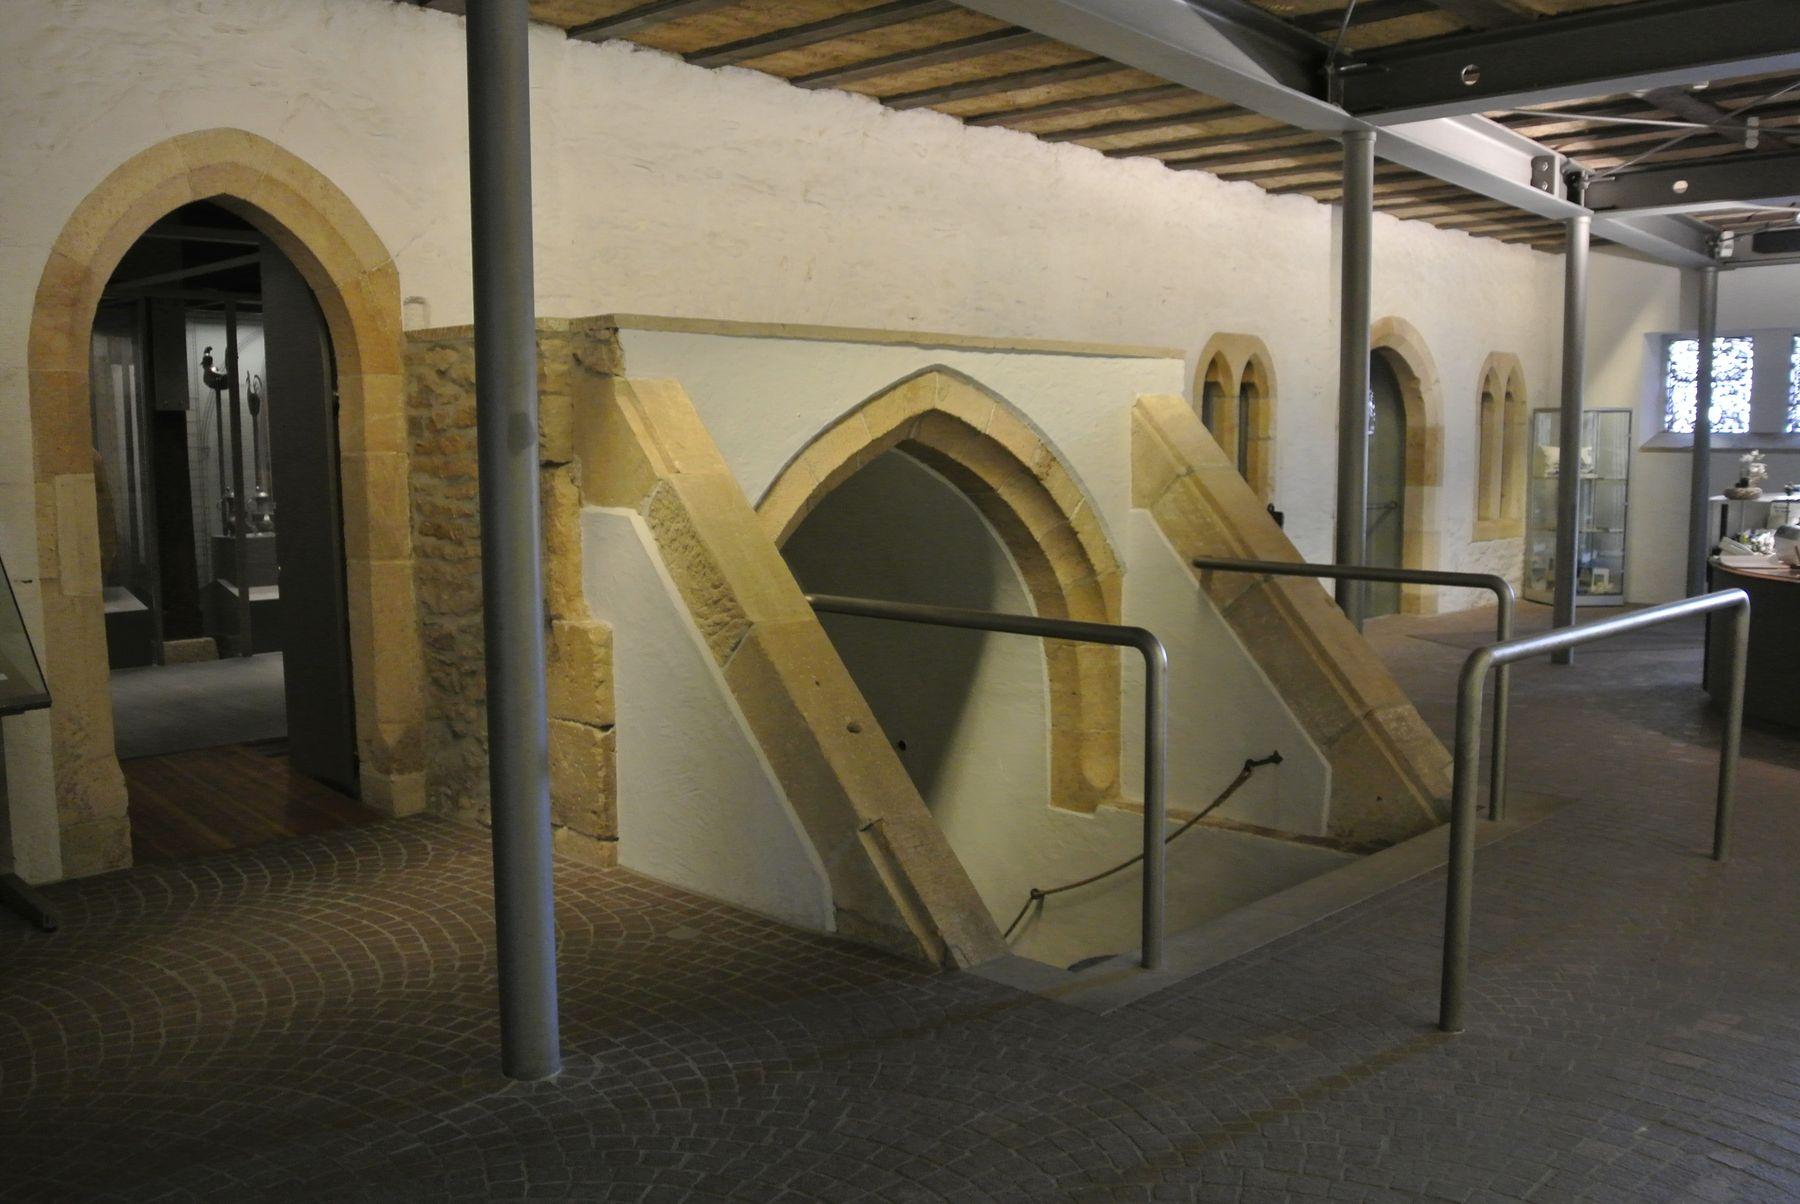 Heimatmuseum Reutlingen, Erdgeschoss, gotische Innenwand aus dem 13. Jahrhundert und Kellerhals